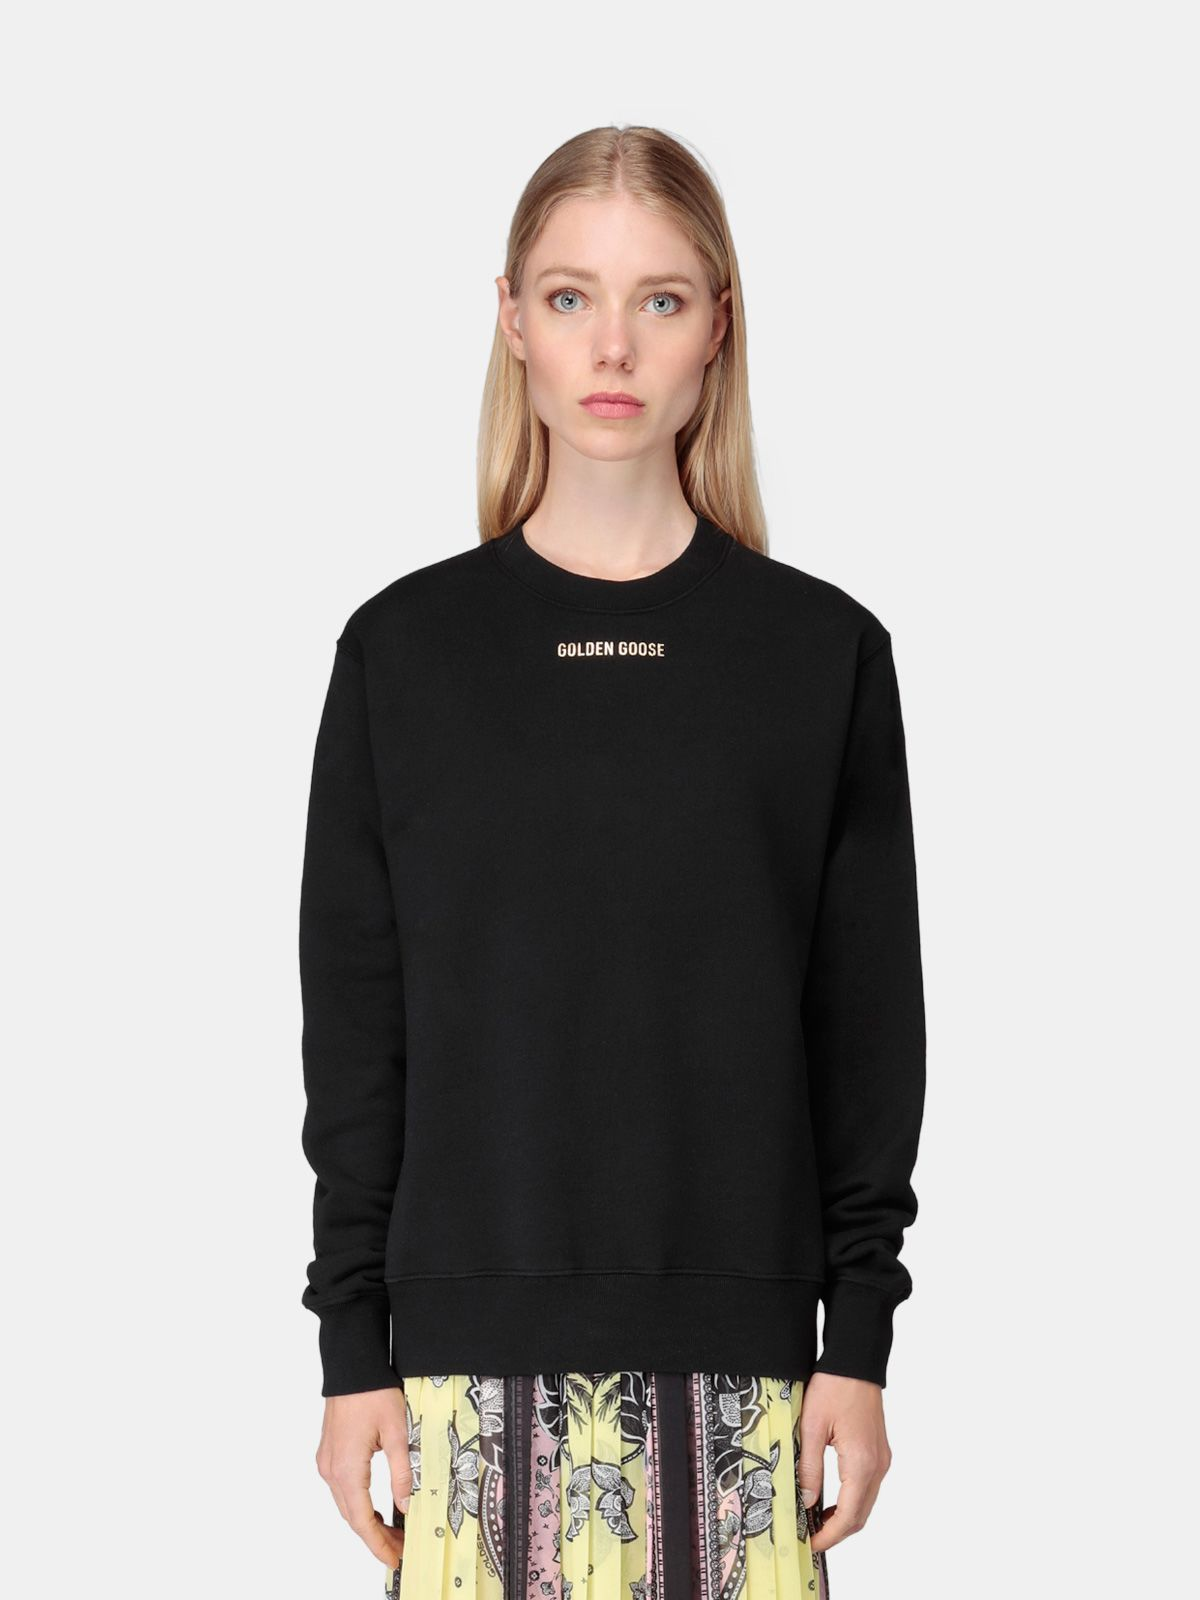 Golden Goose - Sharon sweatshirt in black with glittery print in